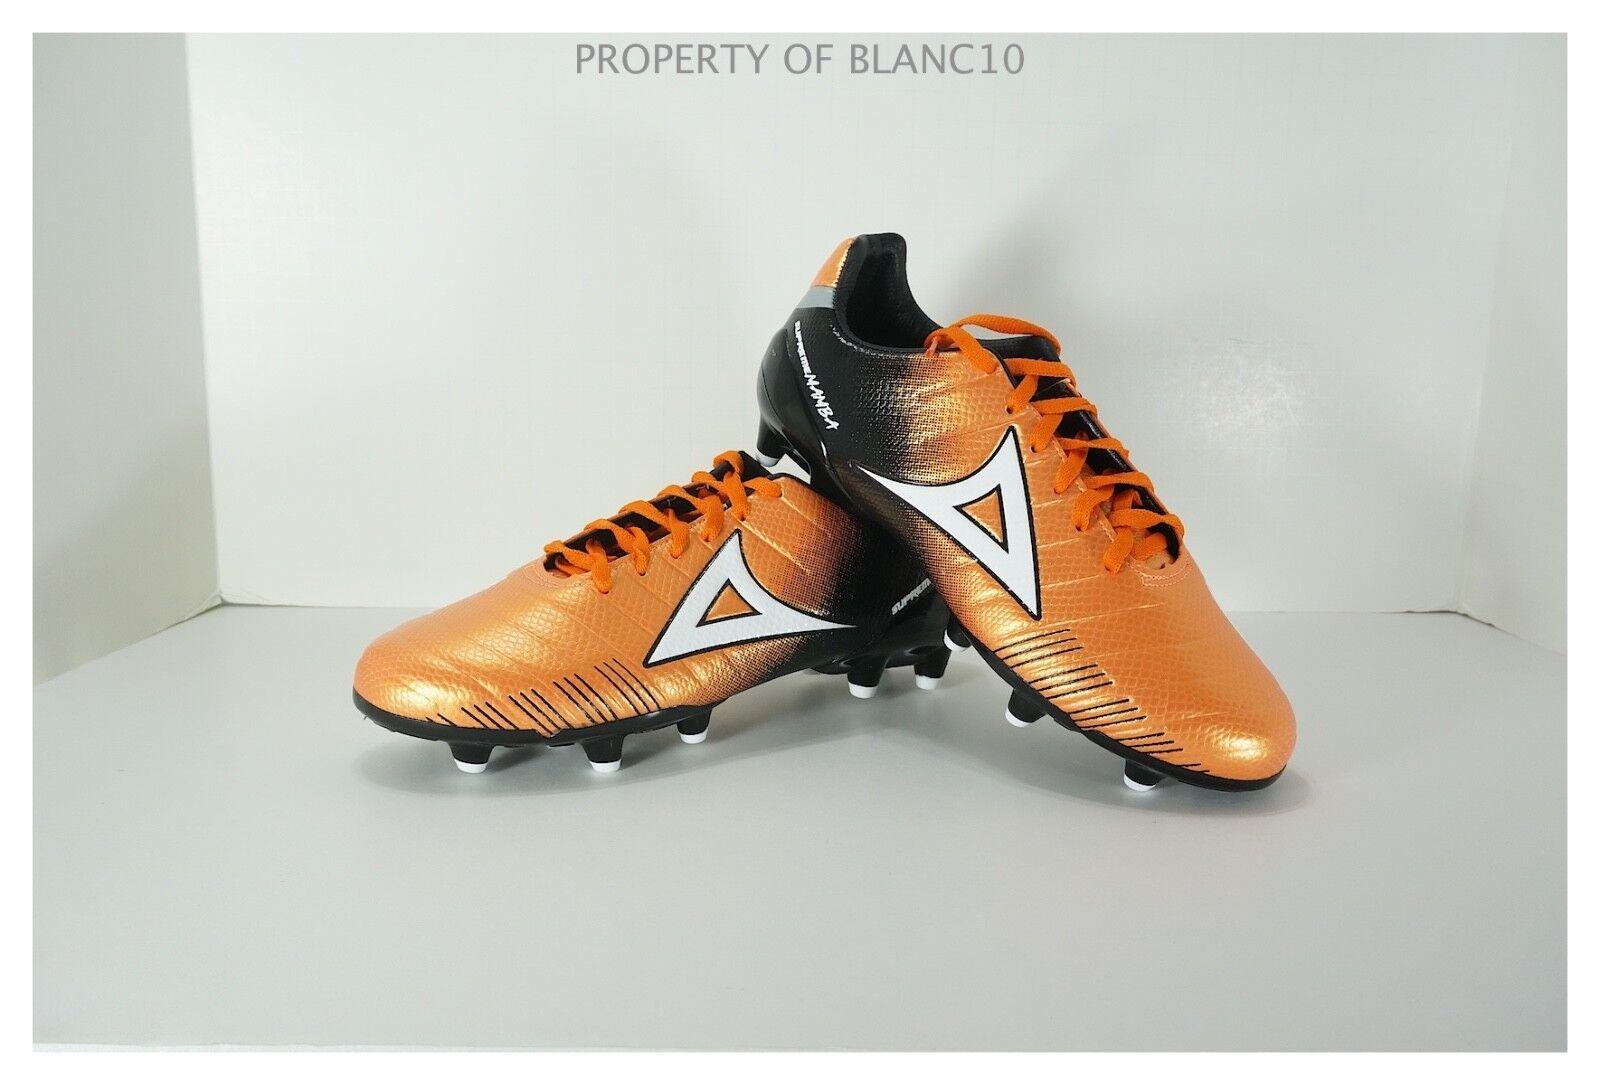 Pirma Soccer Crampons-style 179-Orange noir-Suprême Mamba